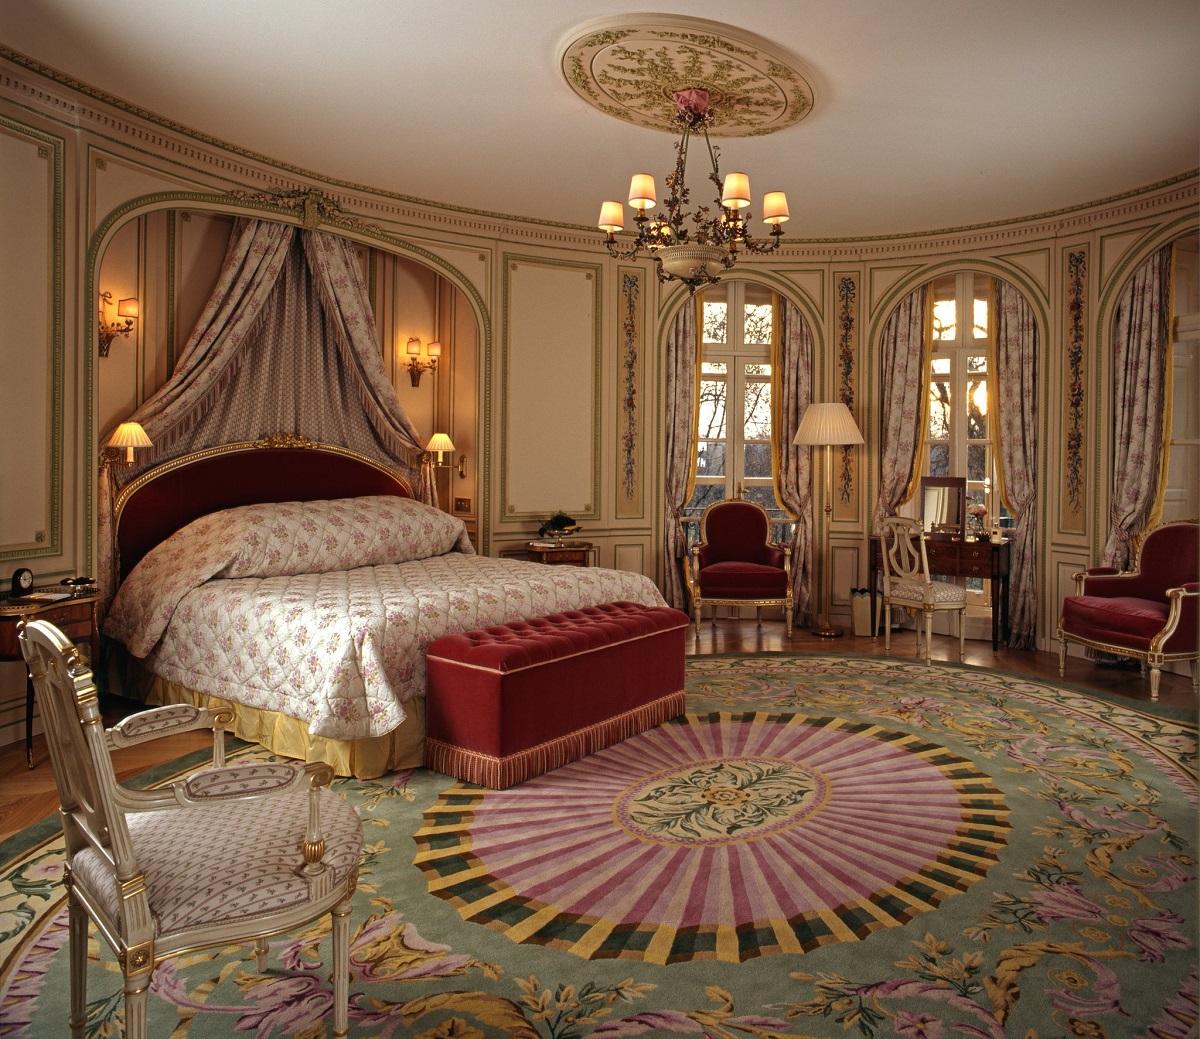 Hotels on Bond Street: The Ritz